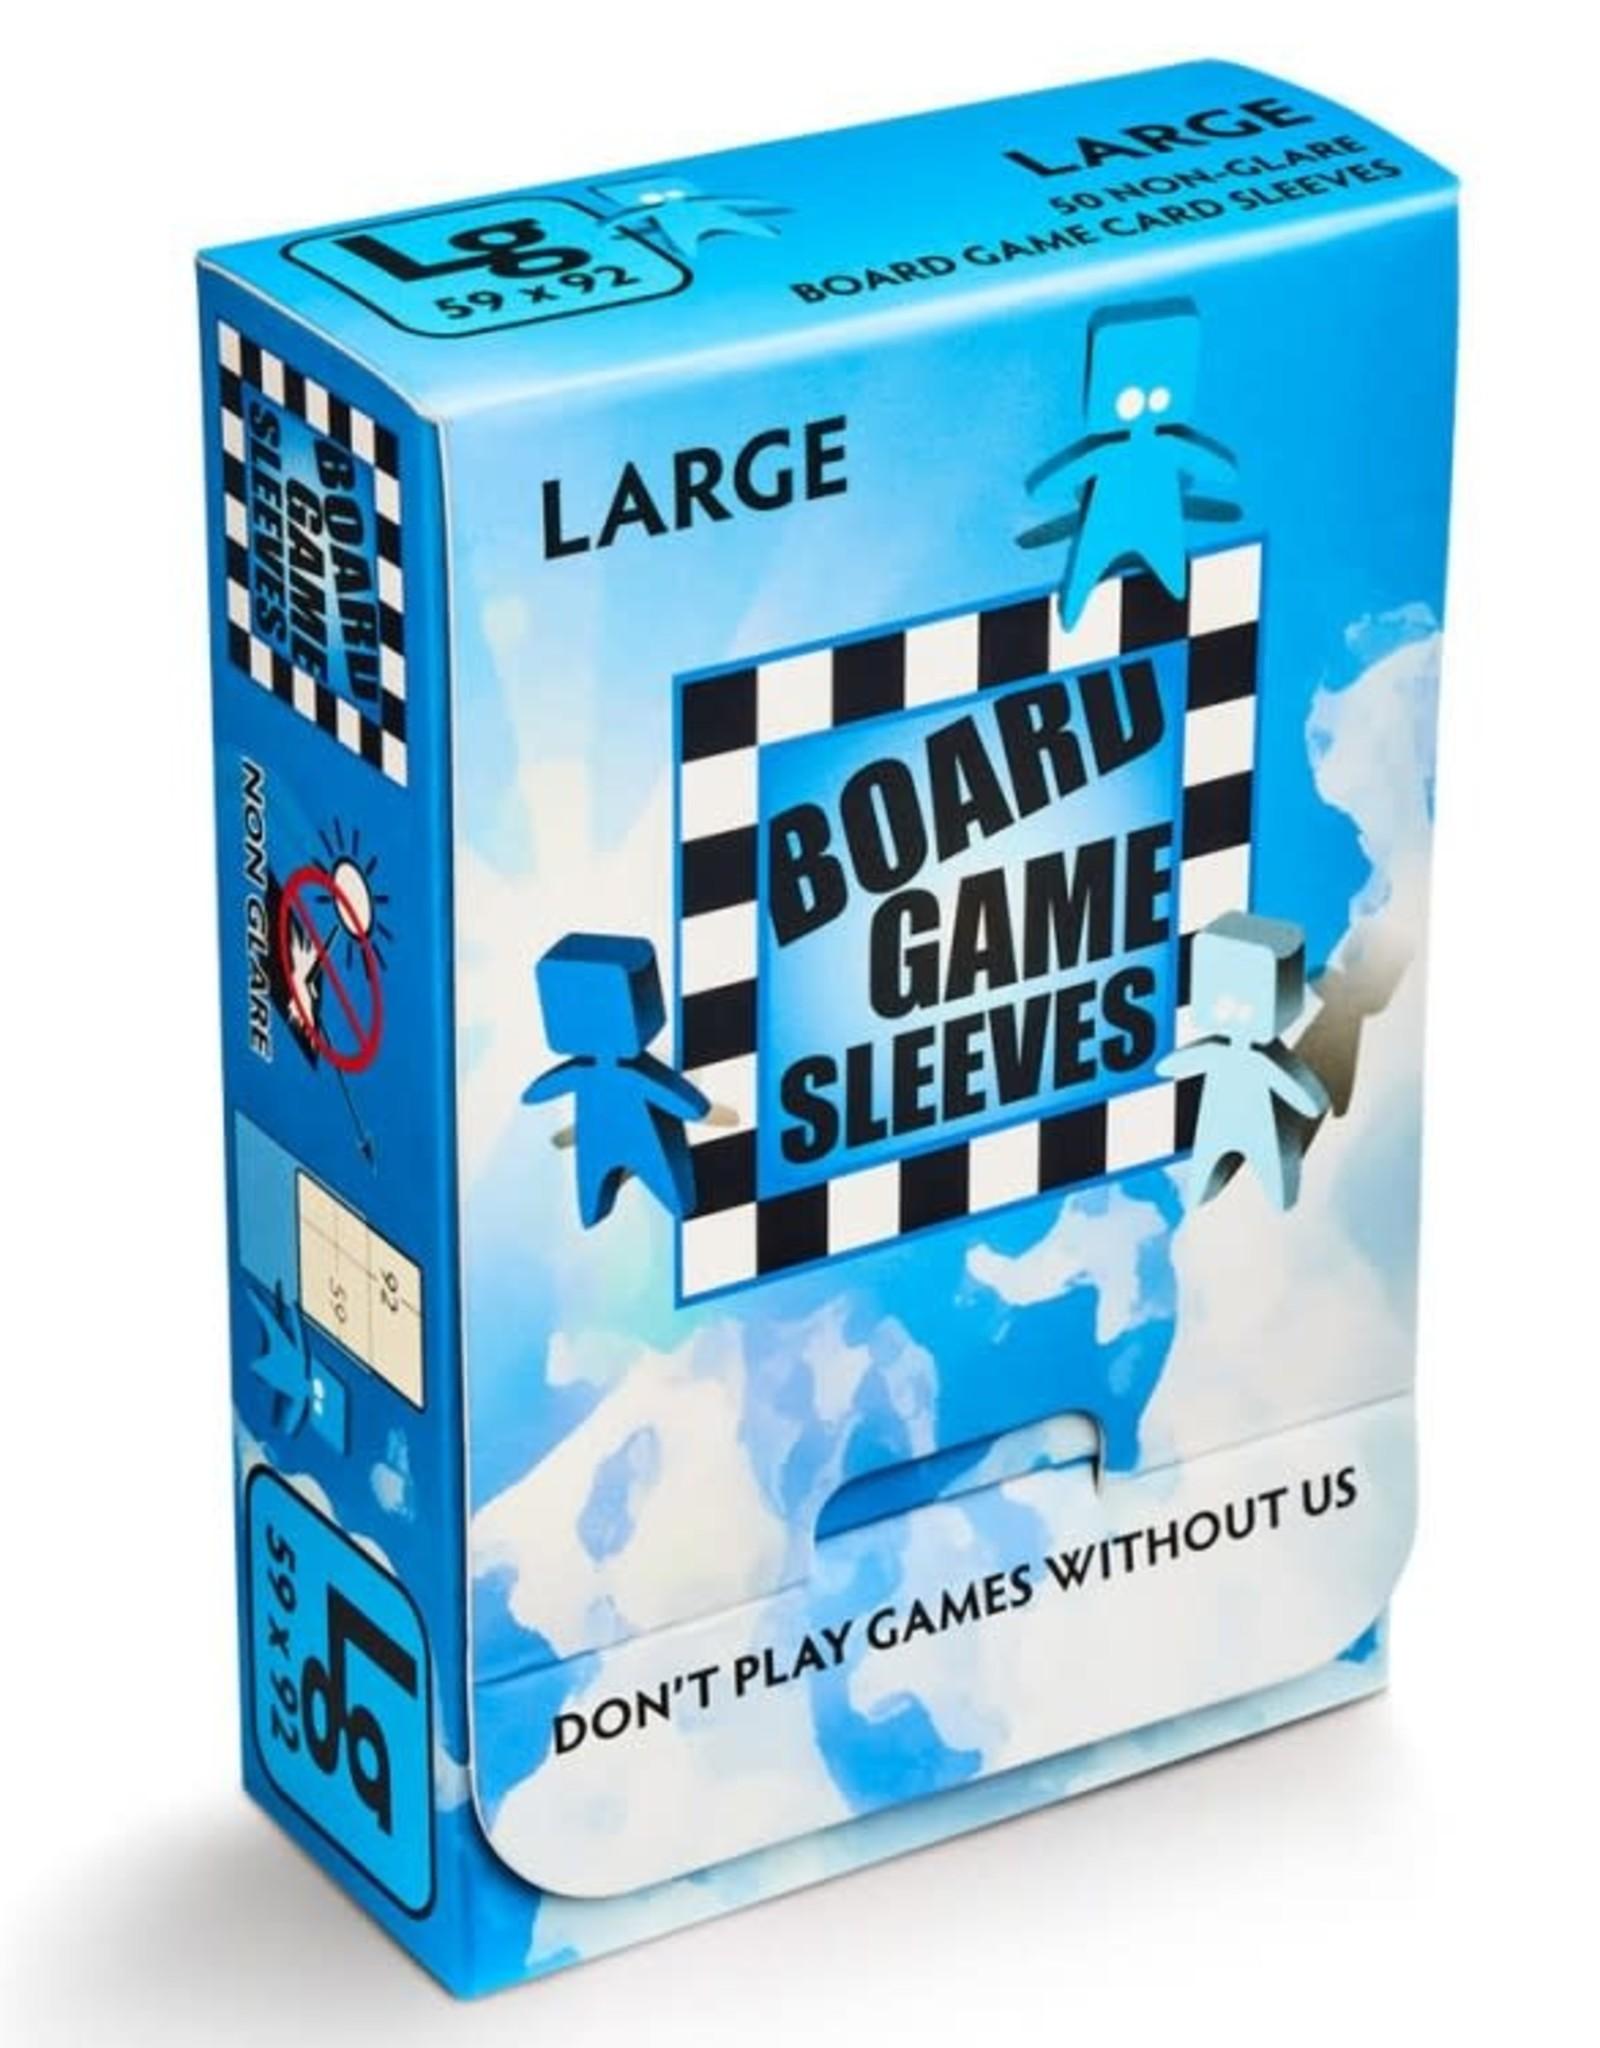 Arcane Tinmen Sleeves: No Glare Large Board Game Sleeves (50)